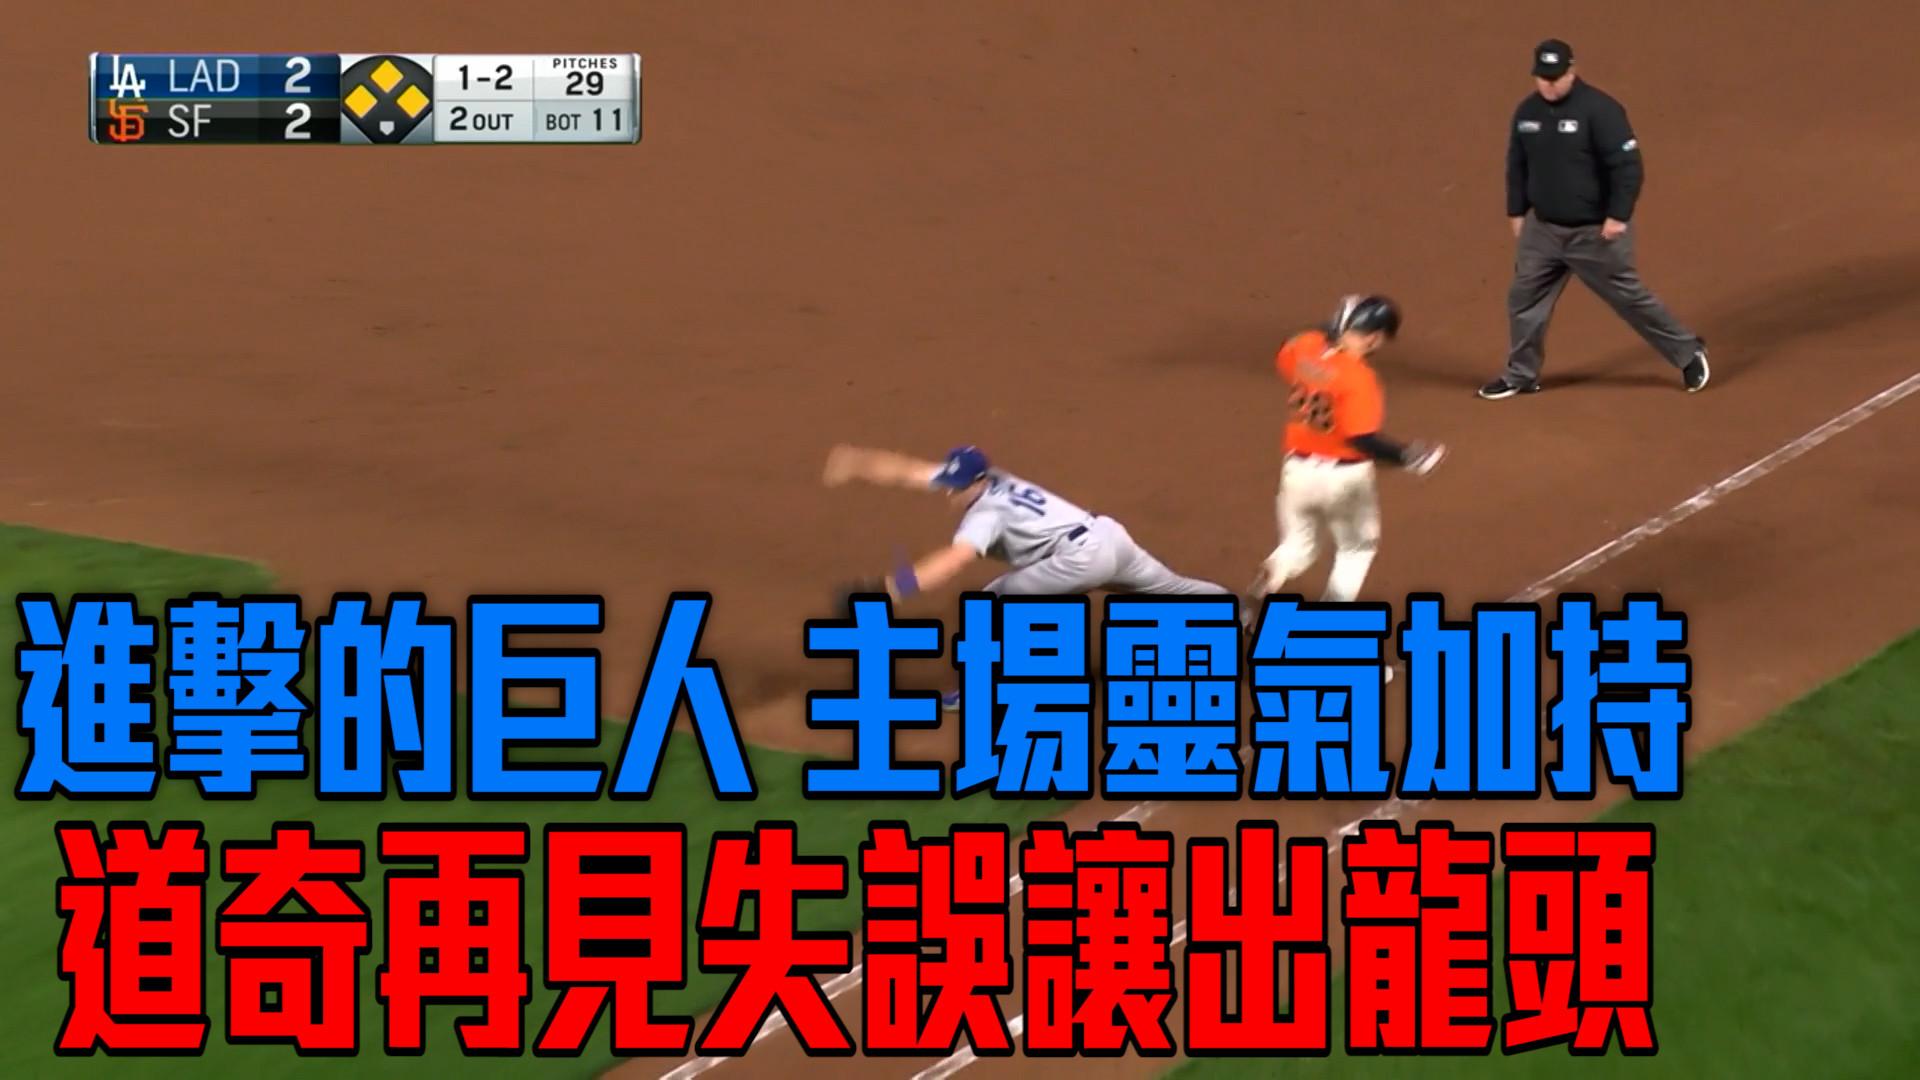 【MLB看愛爾達】道奇再見失誤送幸福 巨人重返龍頭 09/04